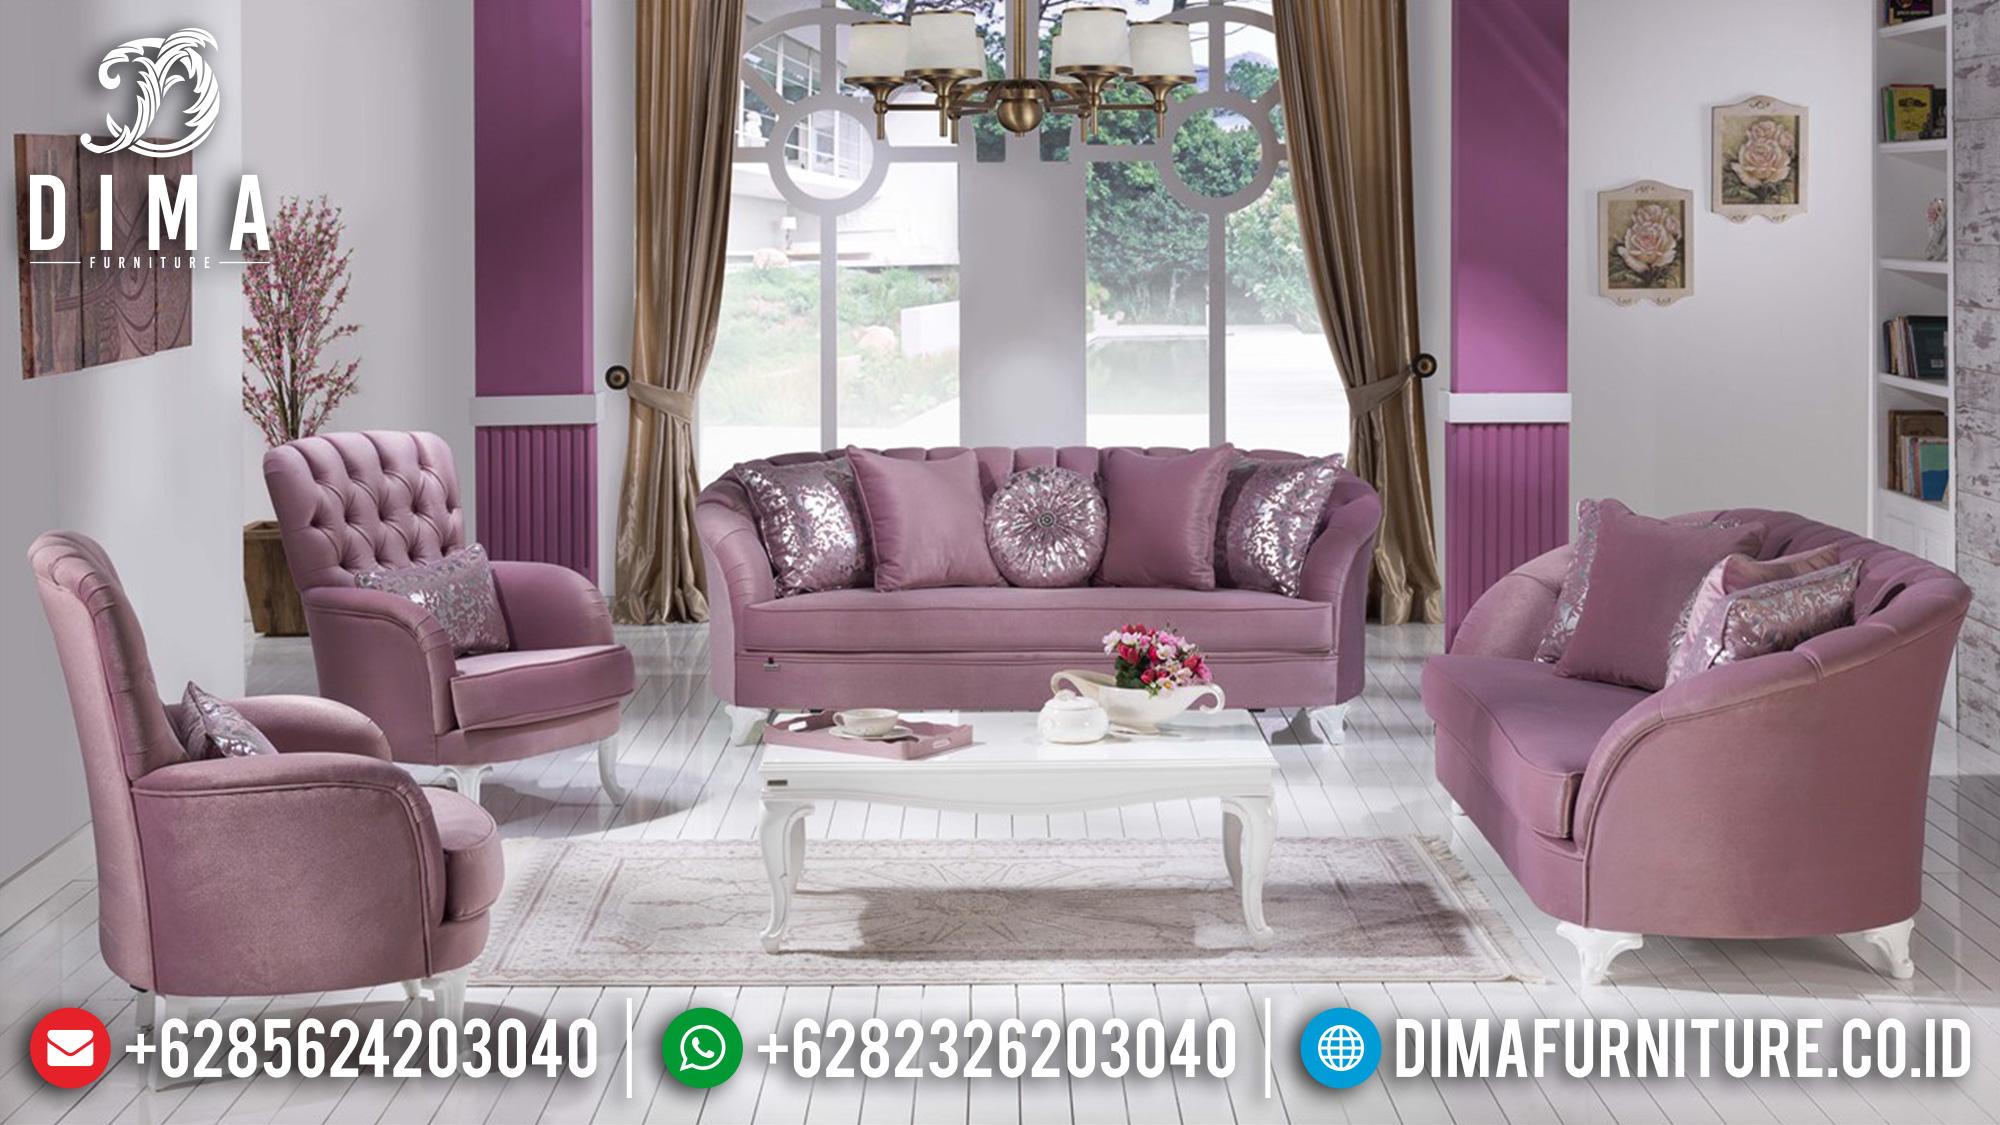 New Style Sofa Tamu Minimalis Putih Duco Luxury Furniture Jepara ST-1302